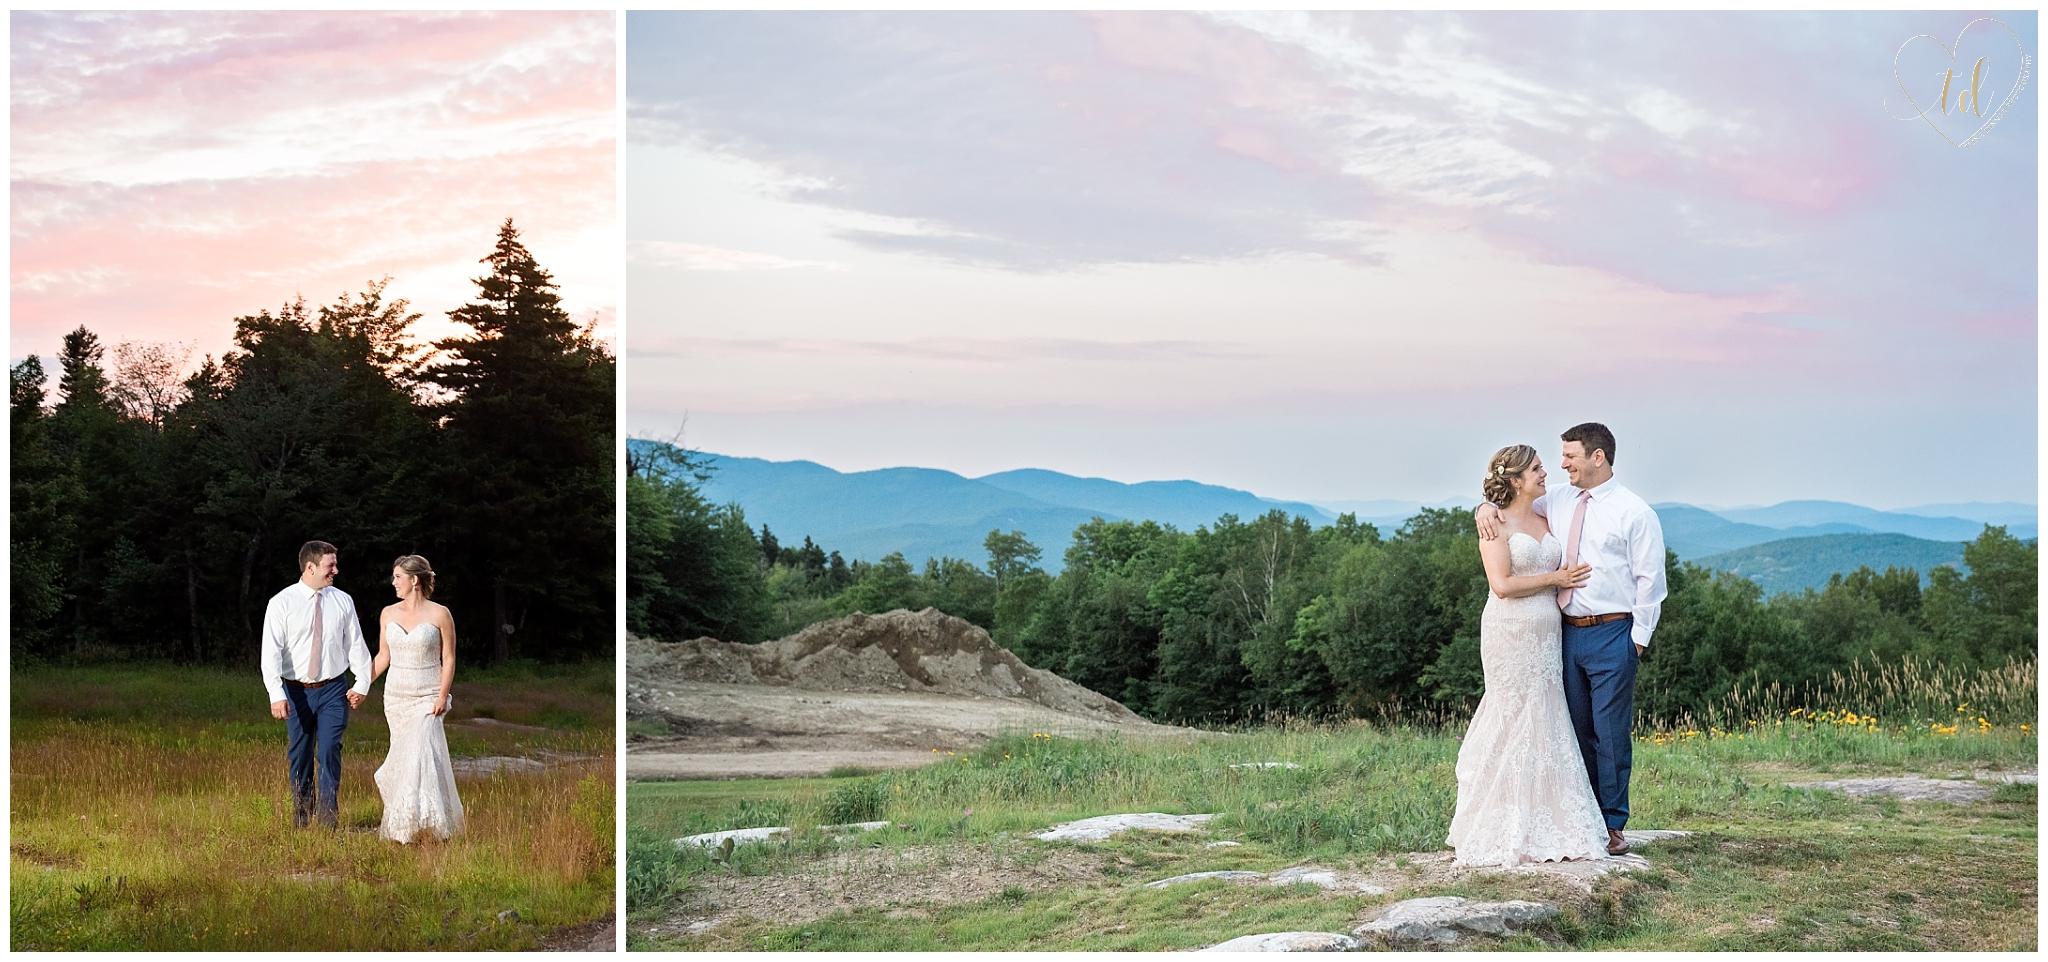 Sunday River Peak Lodge Wedding Portraits